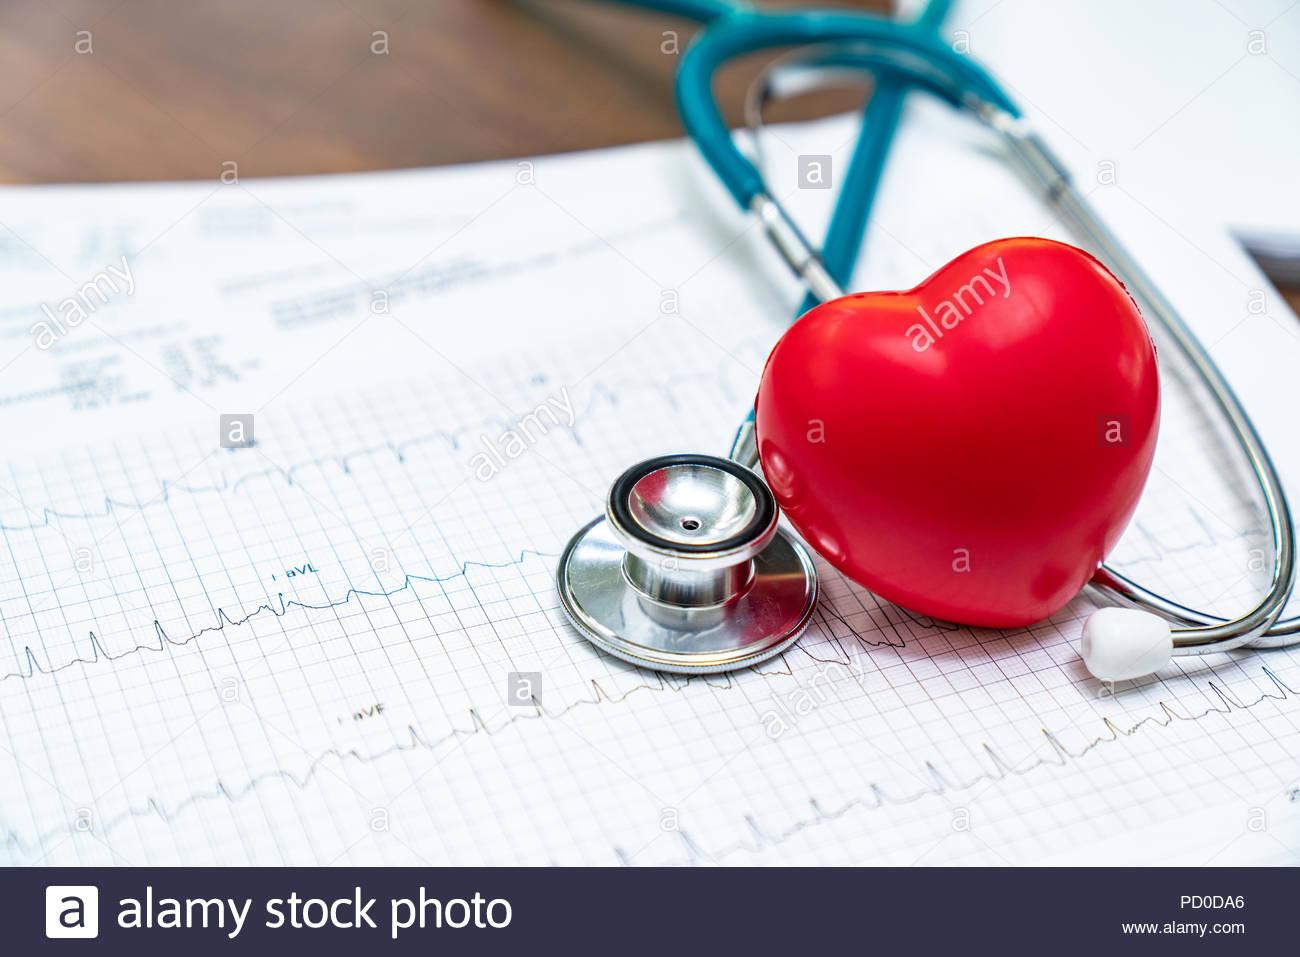 Stethoskop und roten Herzen Herzen prüfen. Konzept healthcare. Stockbild